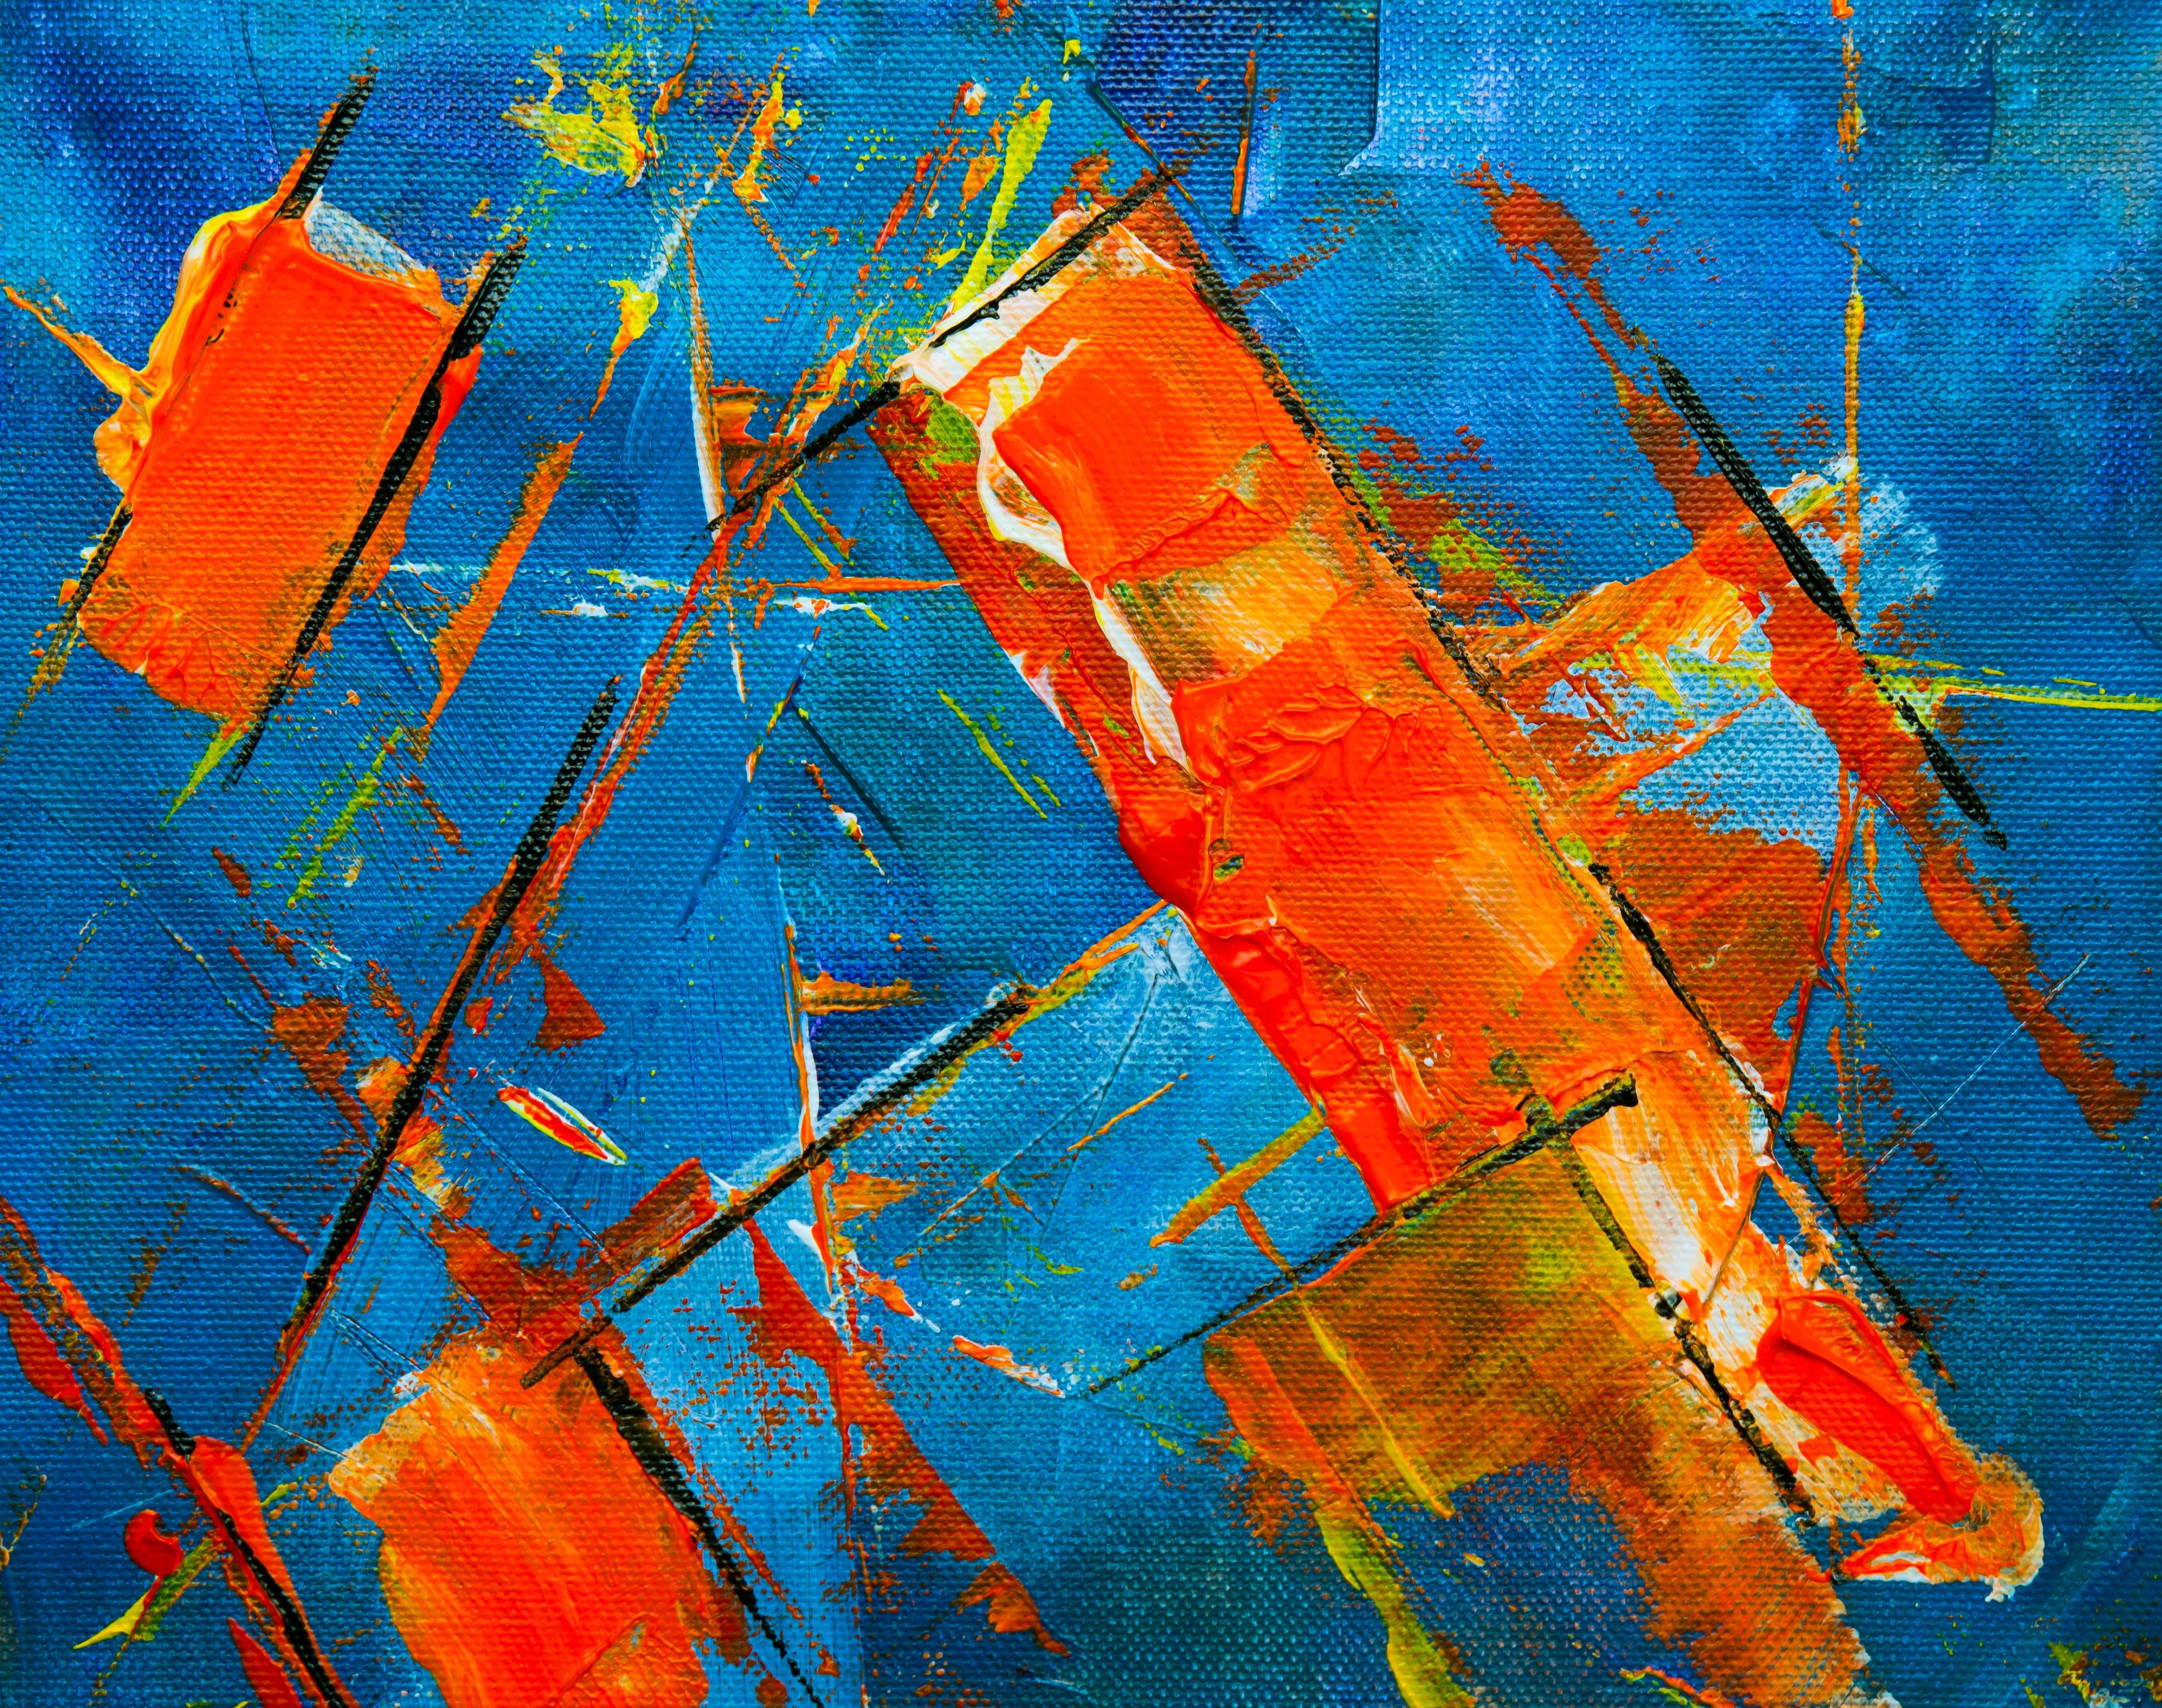 Free stock photo of art, creative, texture, painting